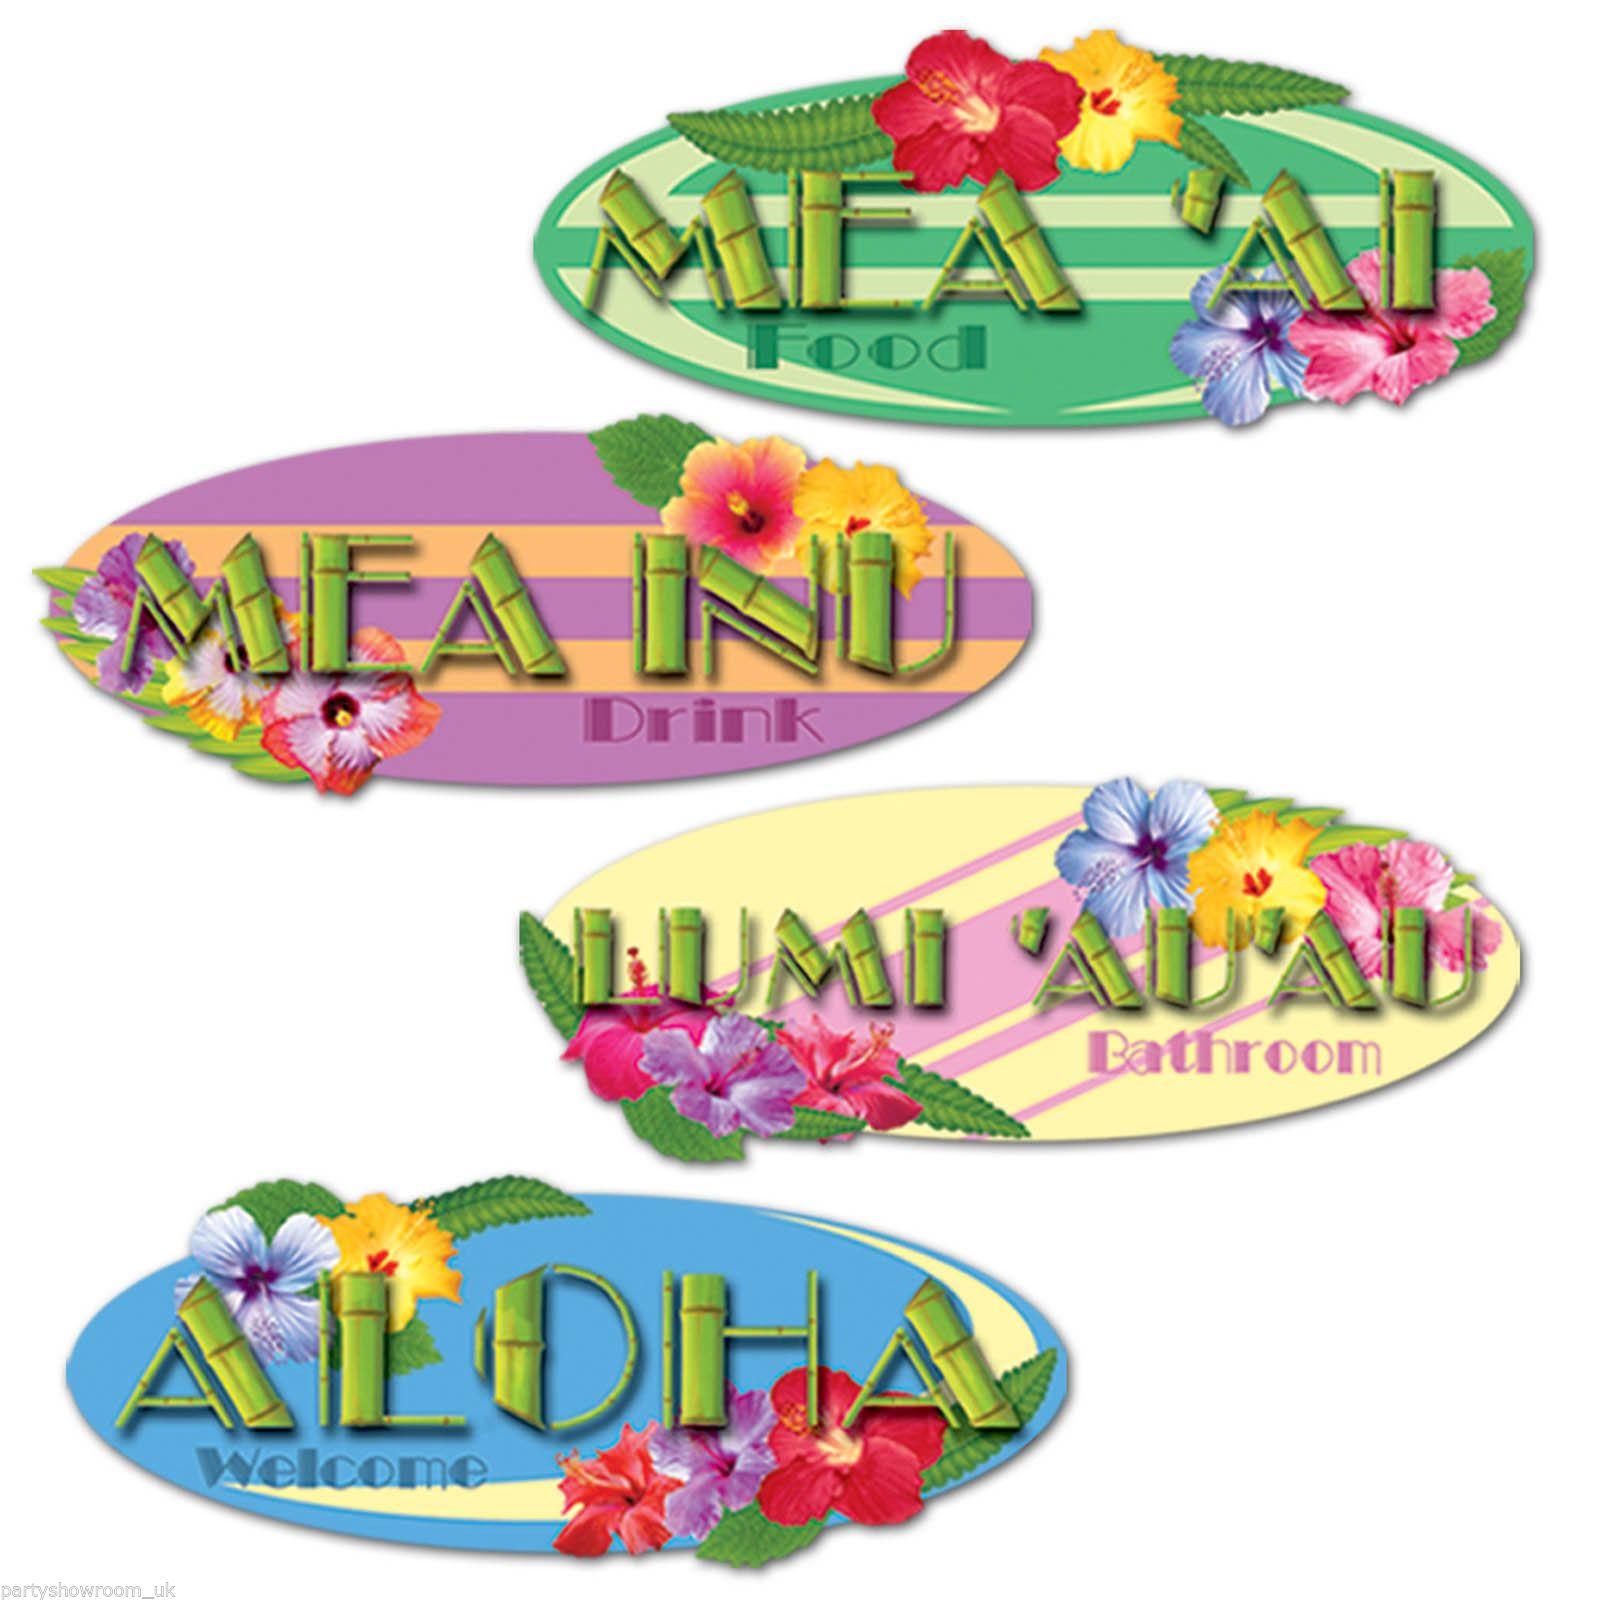 4 tropical hawaiian luau bbq party welcome bathroom signs cutouts rh pinterest com